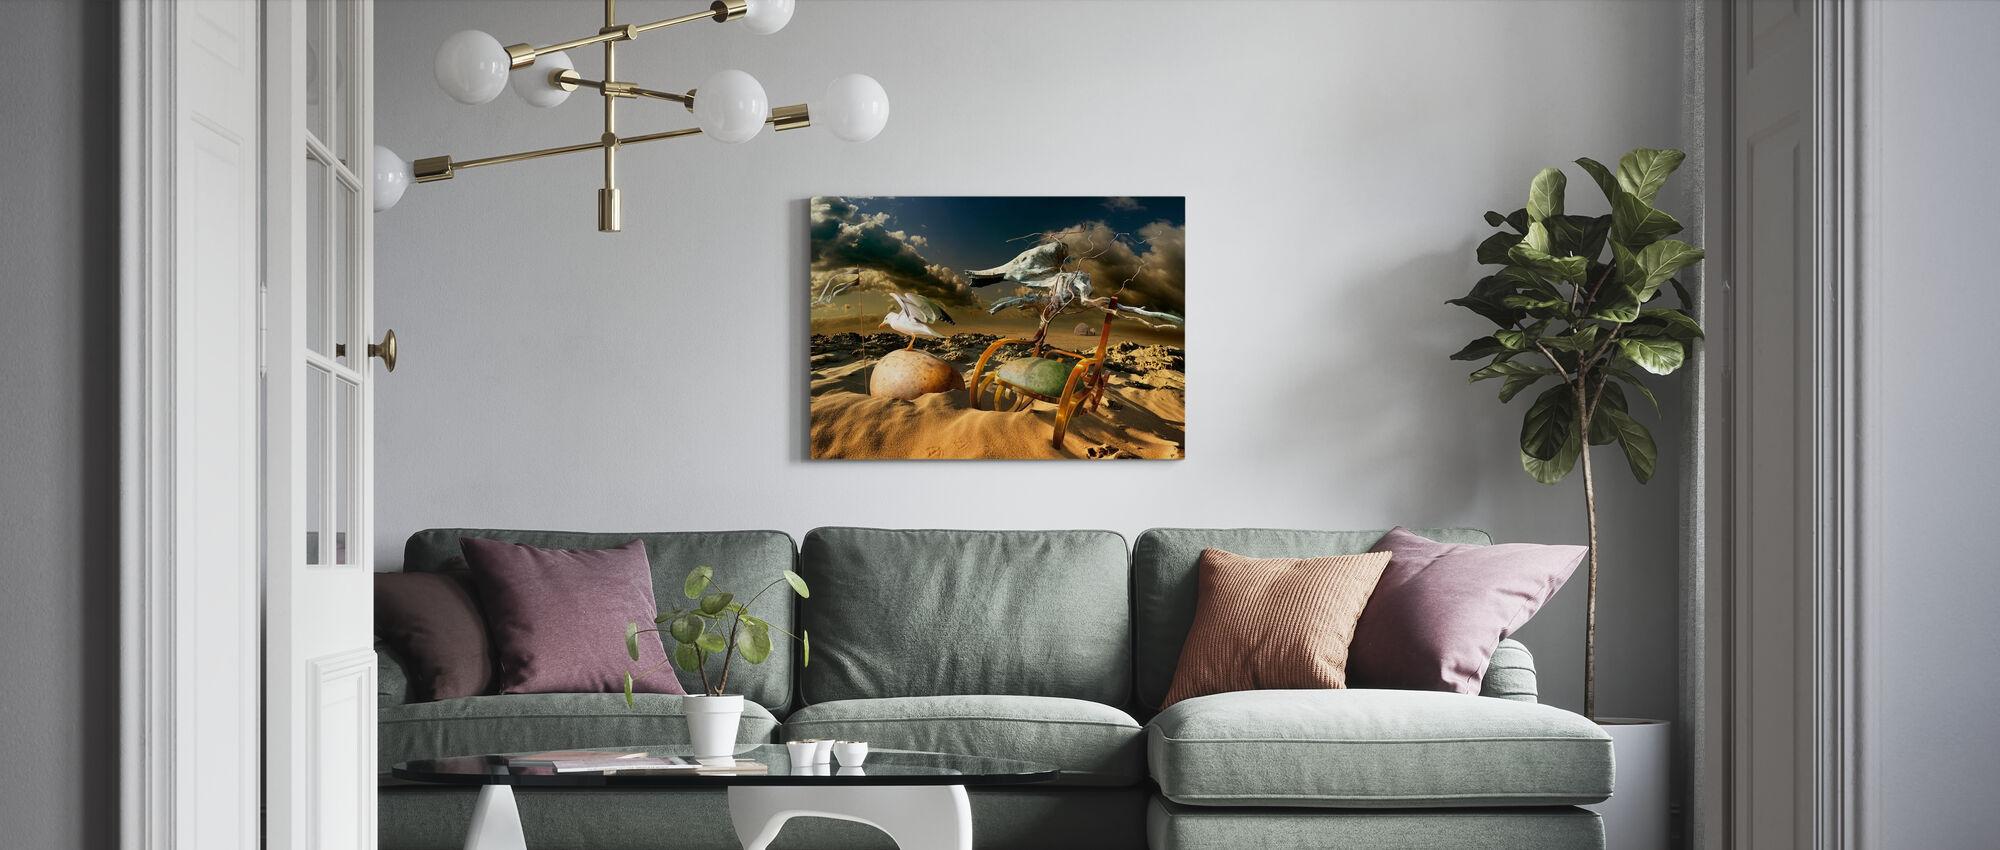 Ökenliv - Canvastavla - Vardagsrum